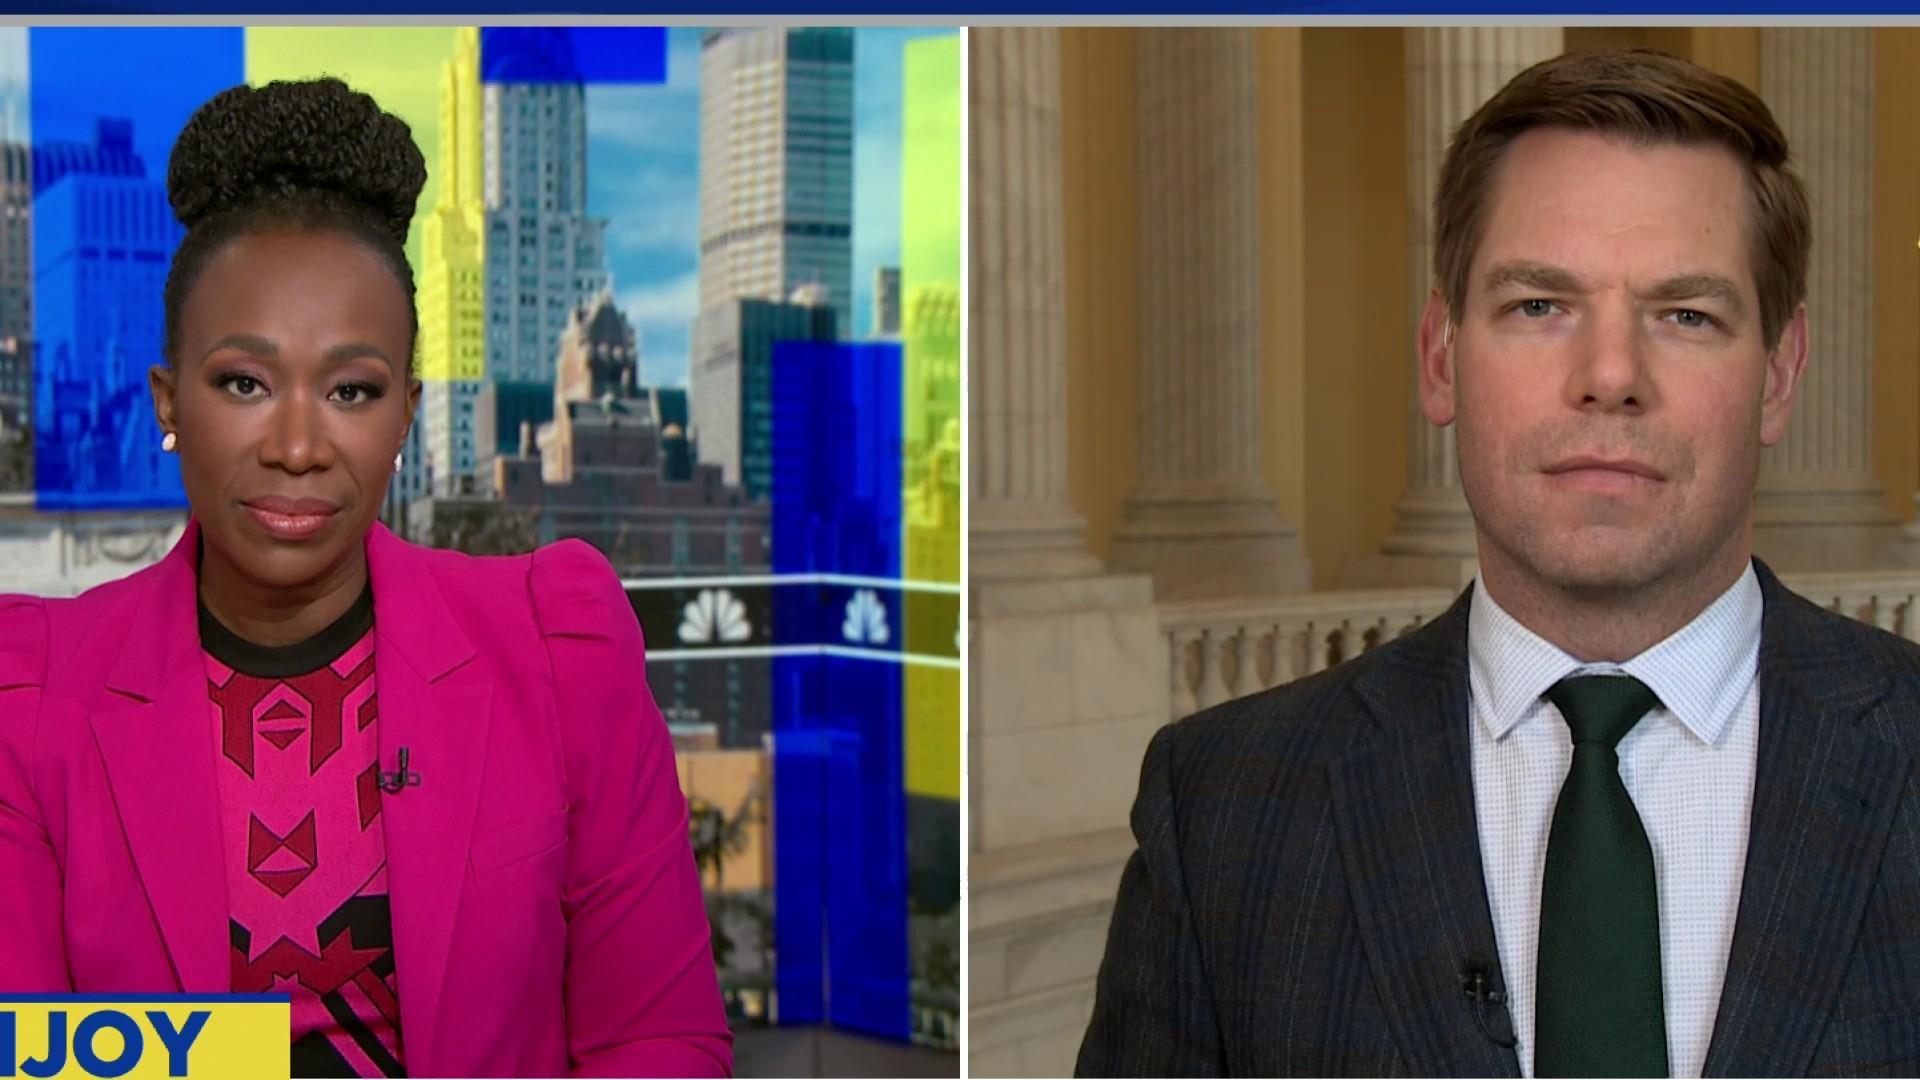 Giuliani called Trump's lawyer in Ukraine scandal by Rep. Swalwell